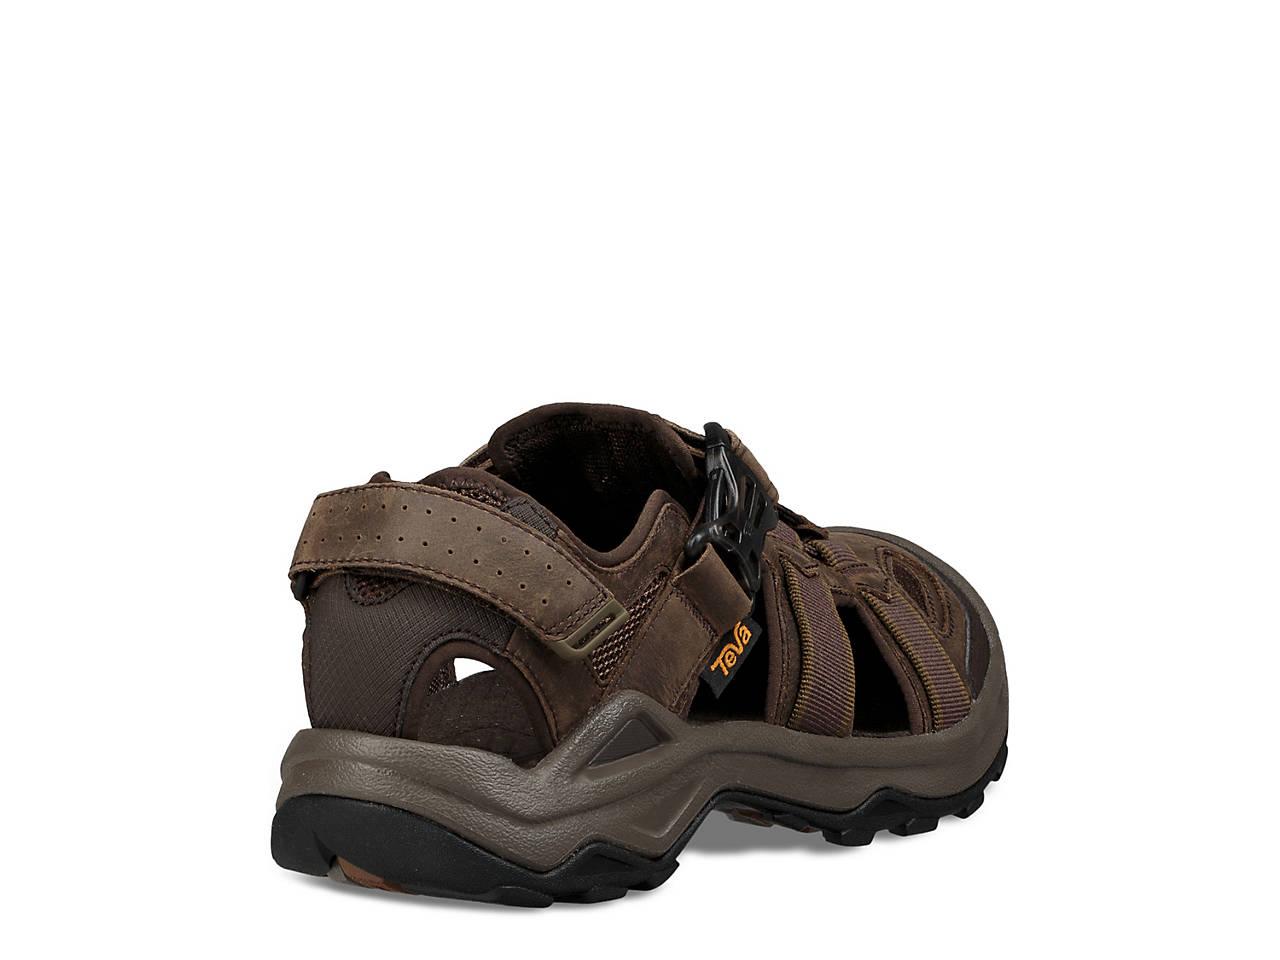 Teva Omnium 2 Leather Fisherman Sandal Men S Shoes Dsw